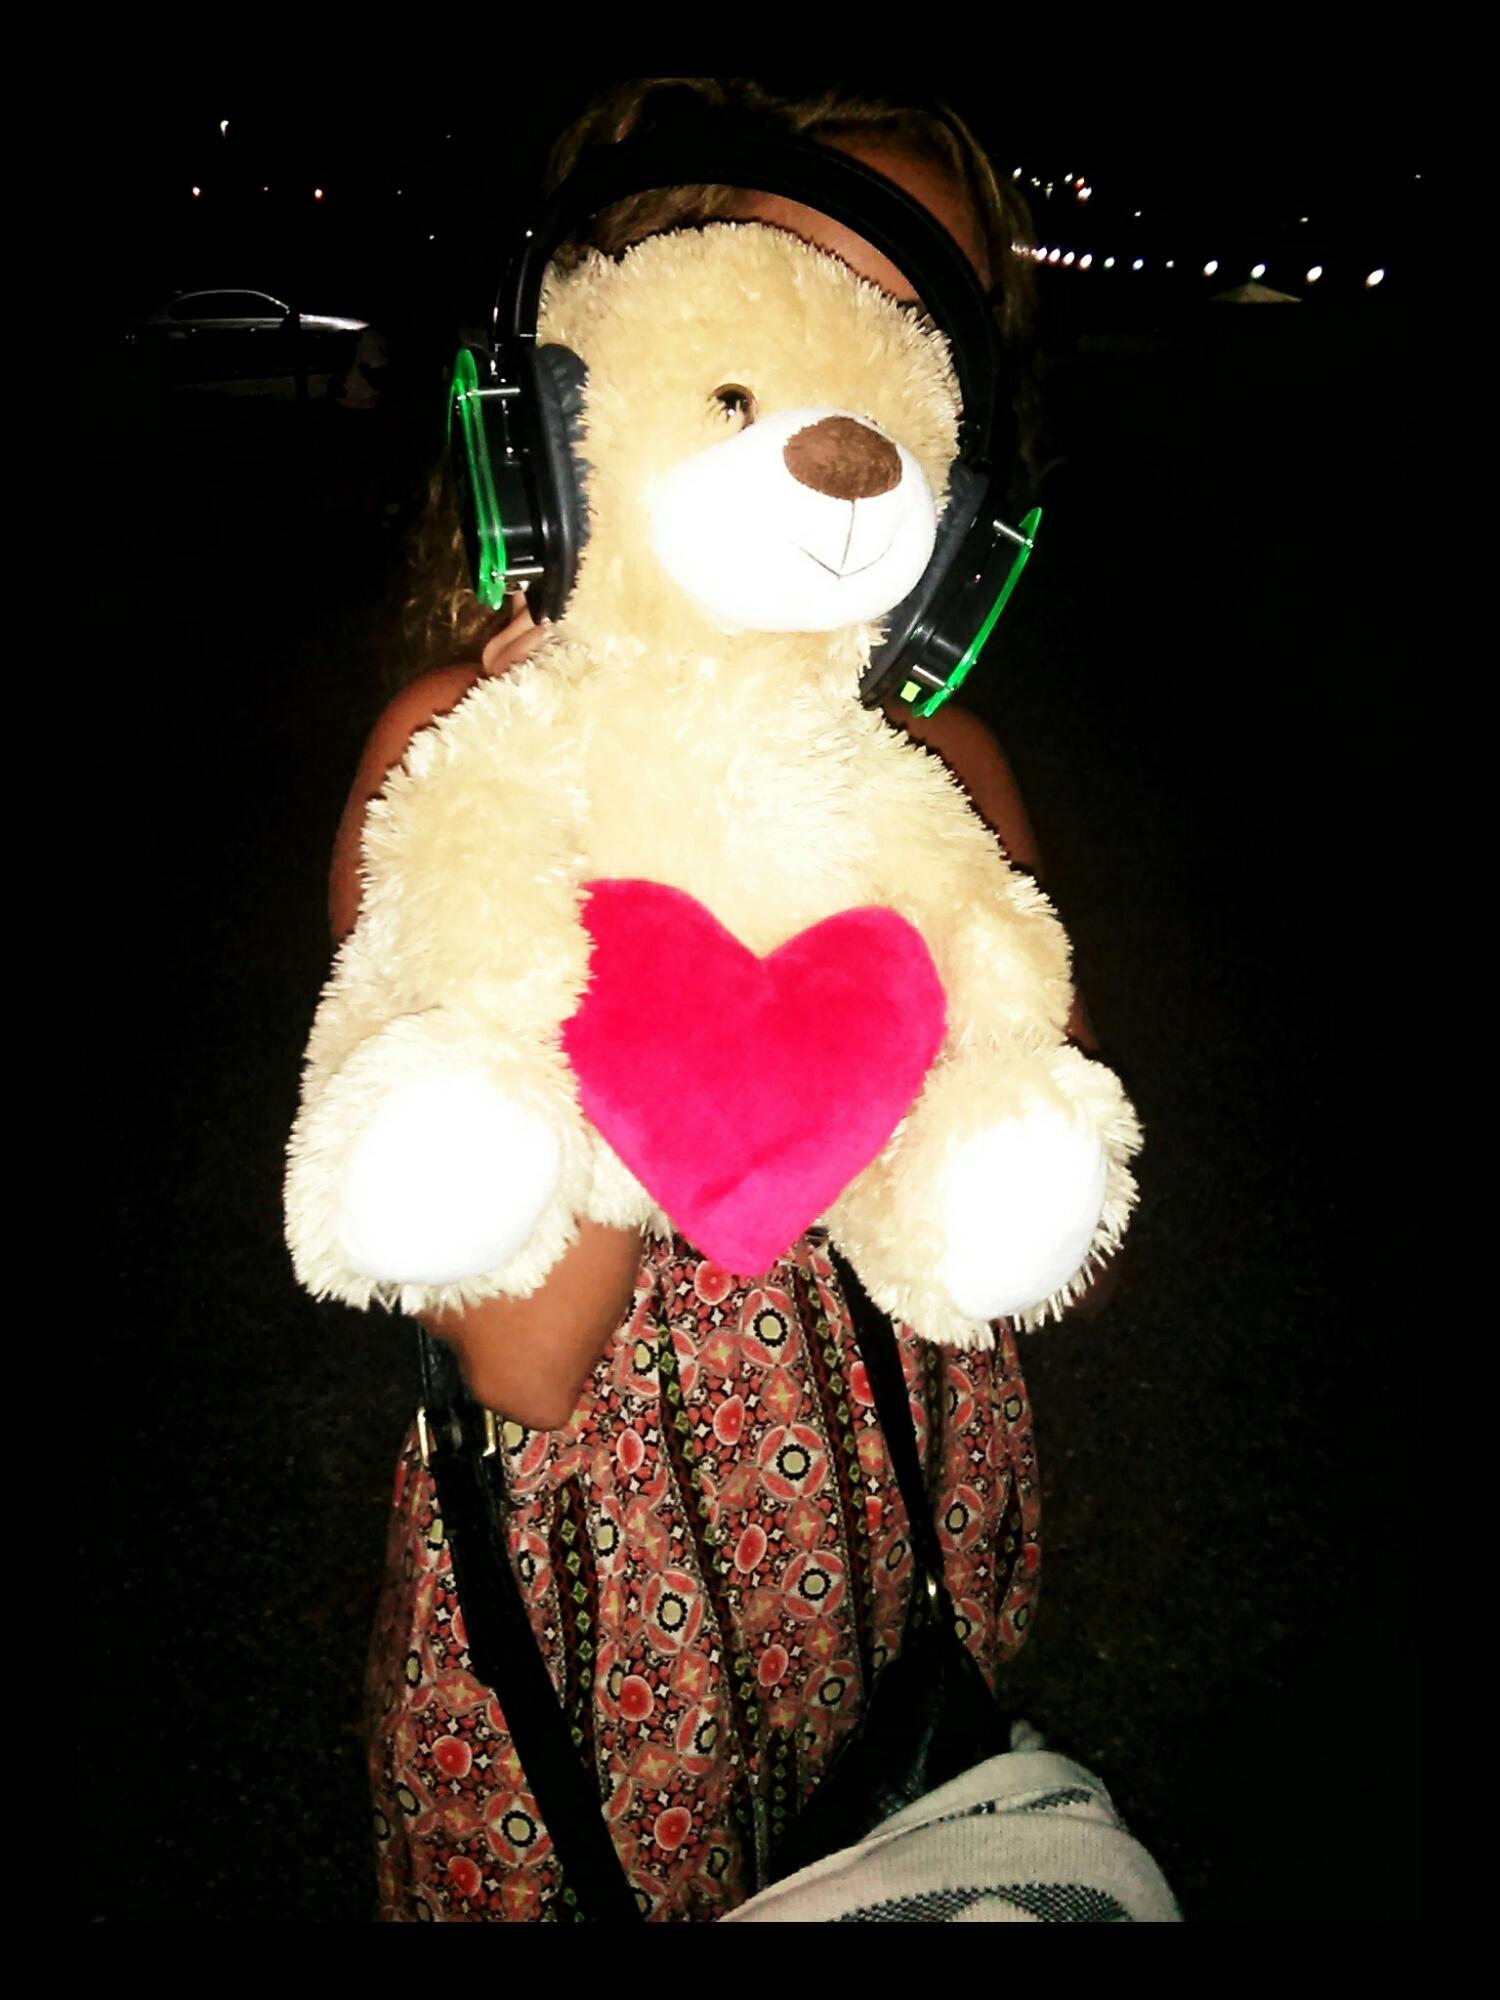 Everyone was welcome, even teddy bears.